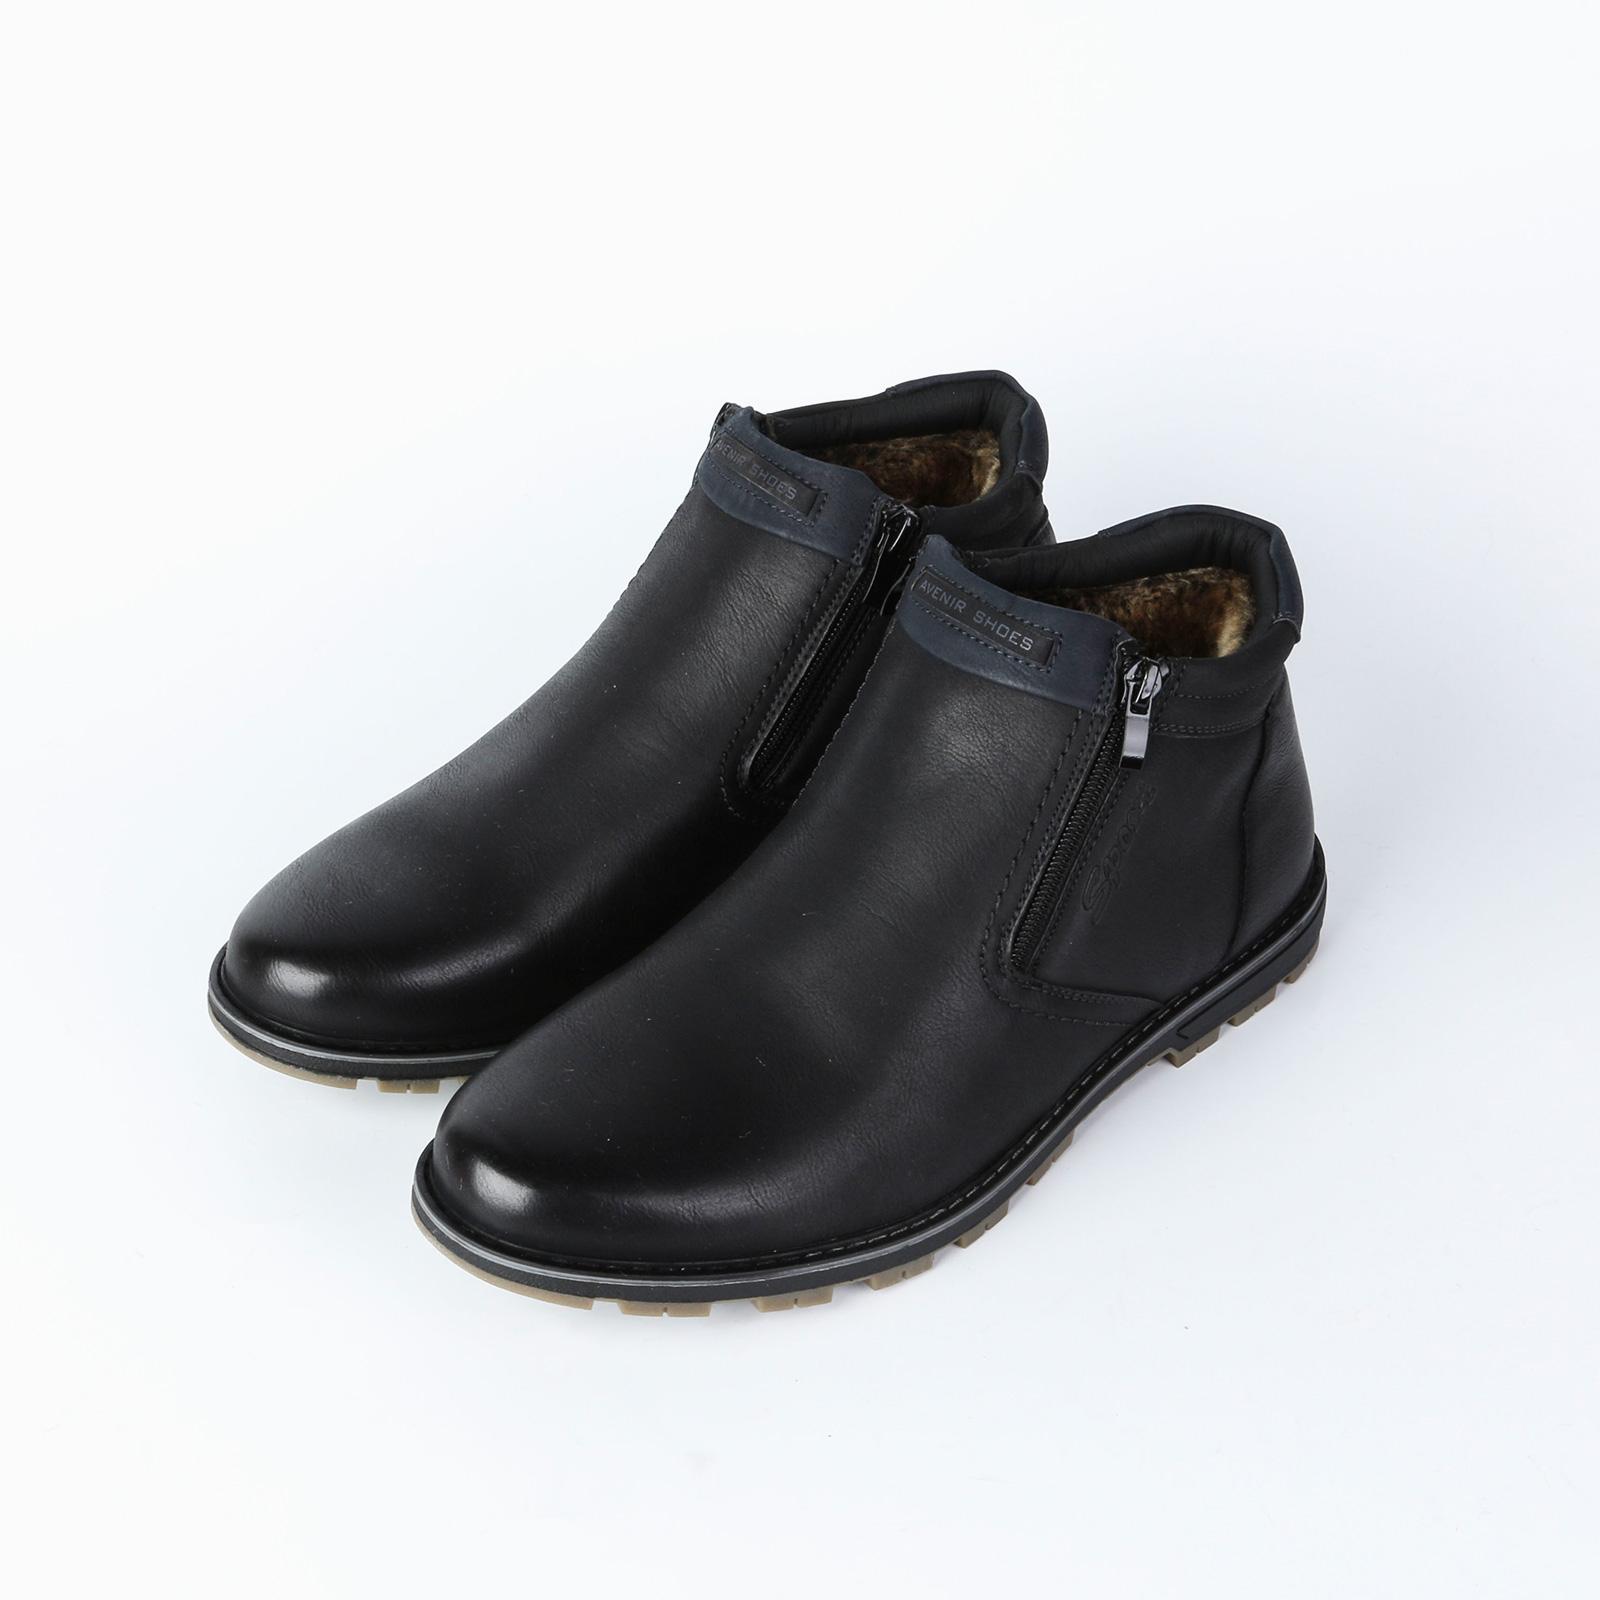 Ботинки мужские на байке